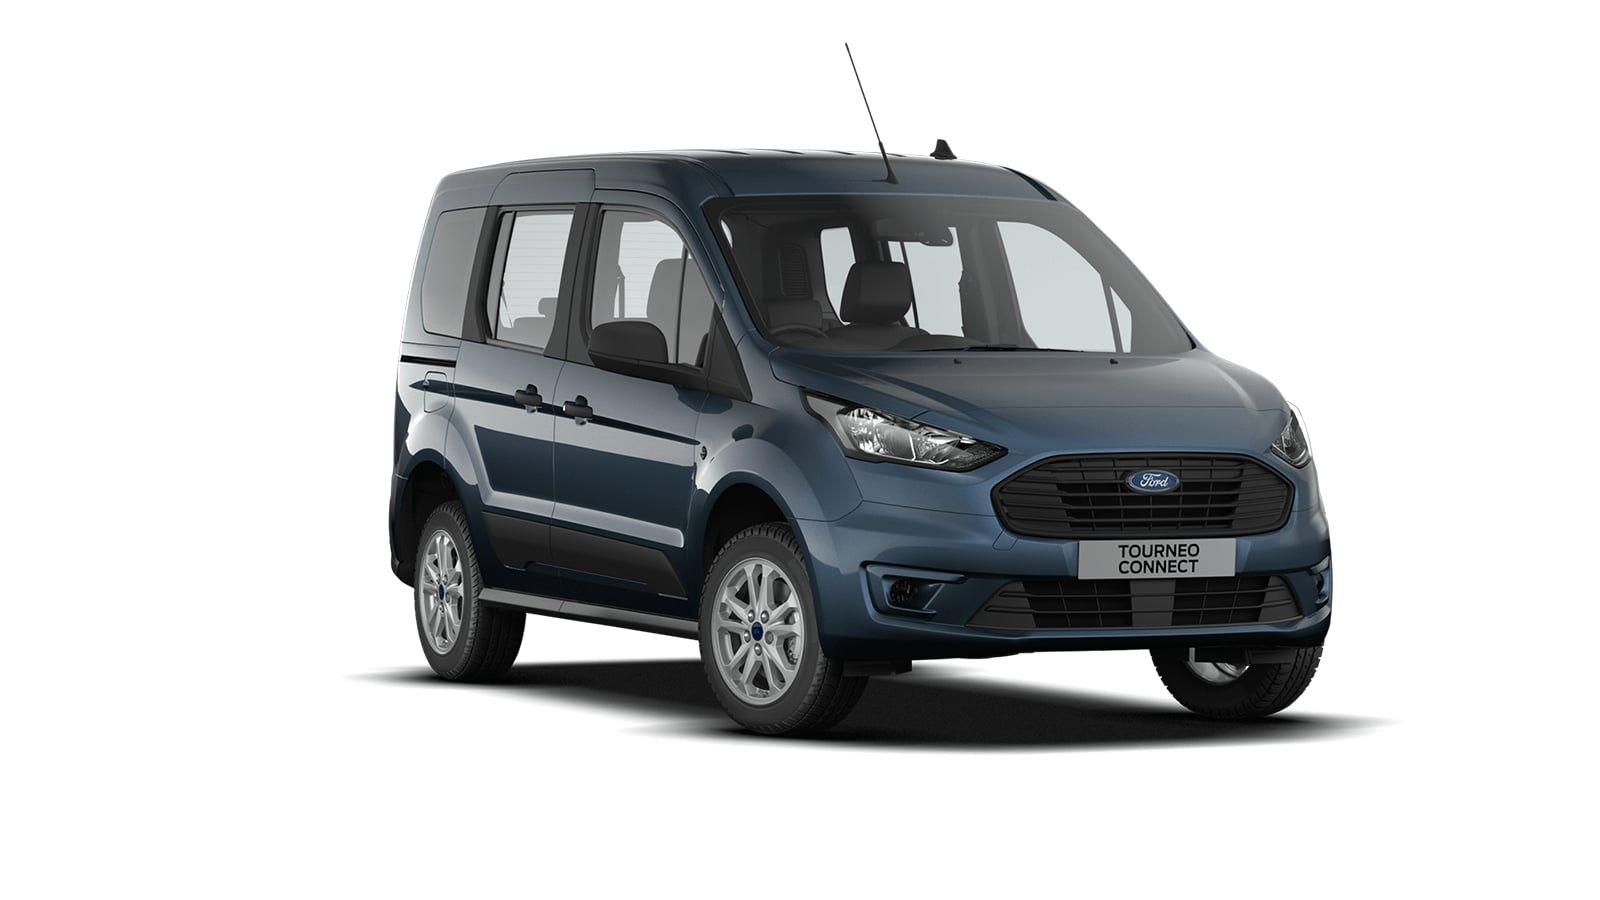 "Nieuw Ford Tourneo connect v408 Tourneo - Trend - 1.5 Duratorq TDCi 120ps / 88kW (270Nm) A8 US5 - Niet-metaalkleur ""Frozen White"" 4"